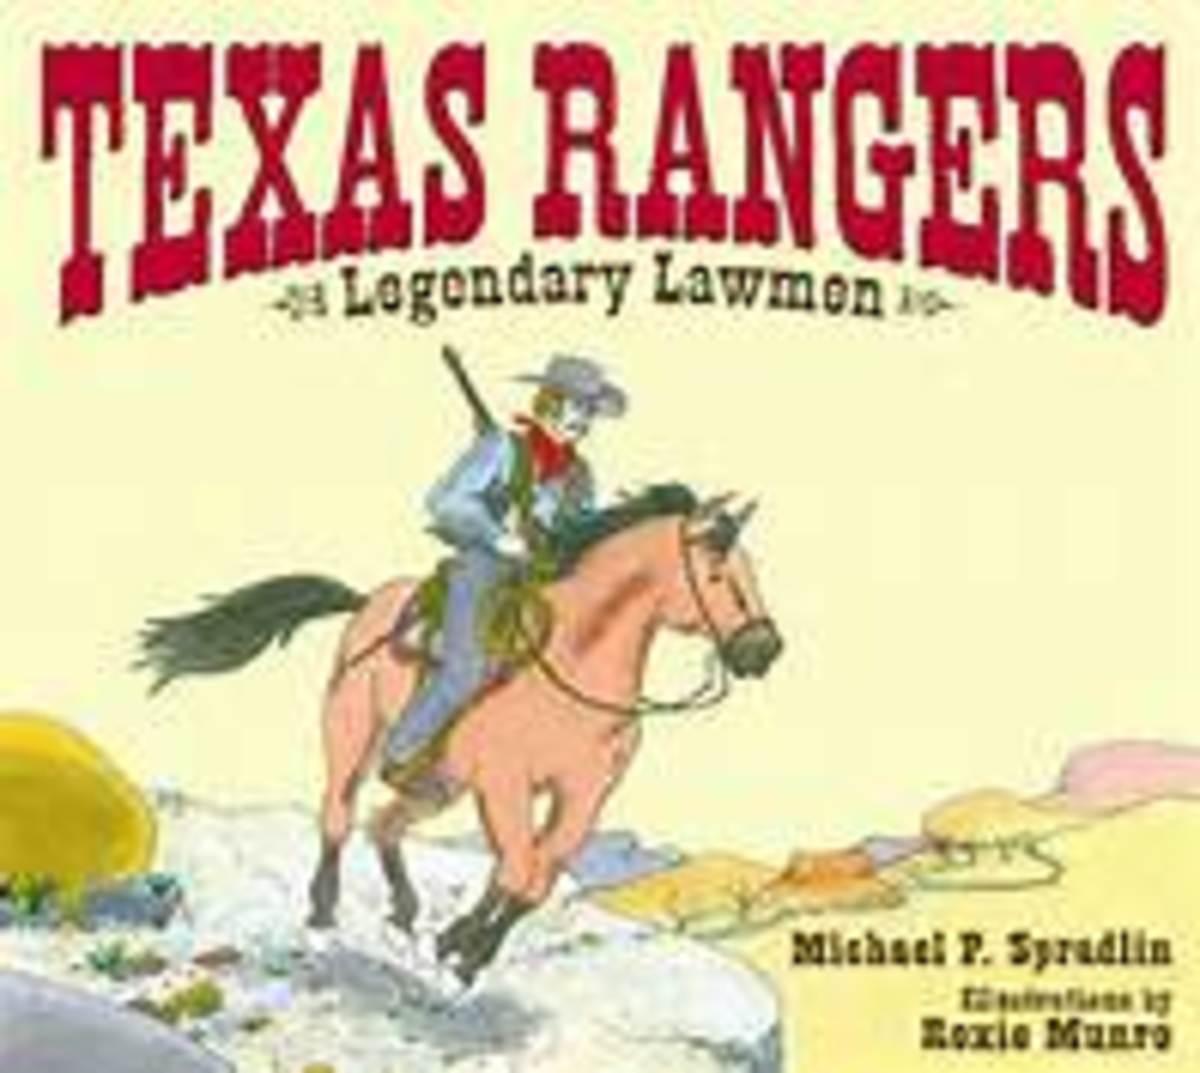 Texas Rangers: Legendary Lawmen by Michael P. Spradlin